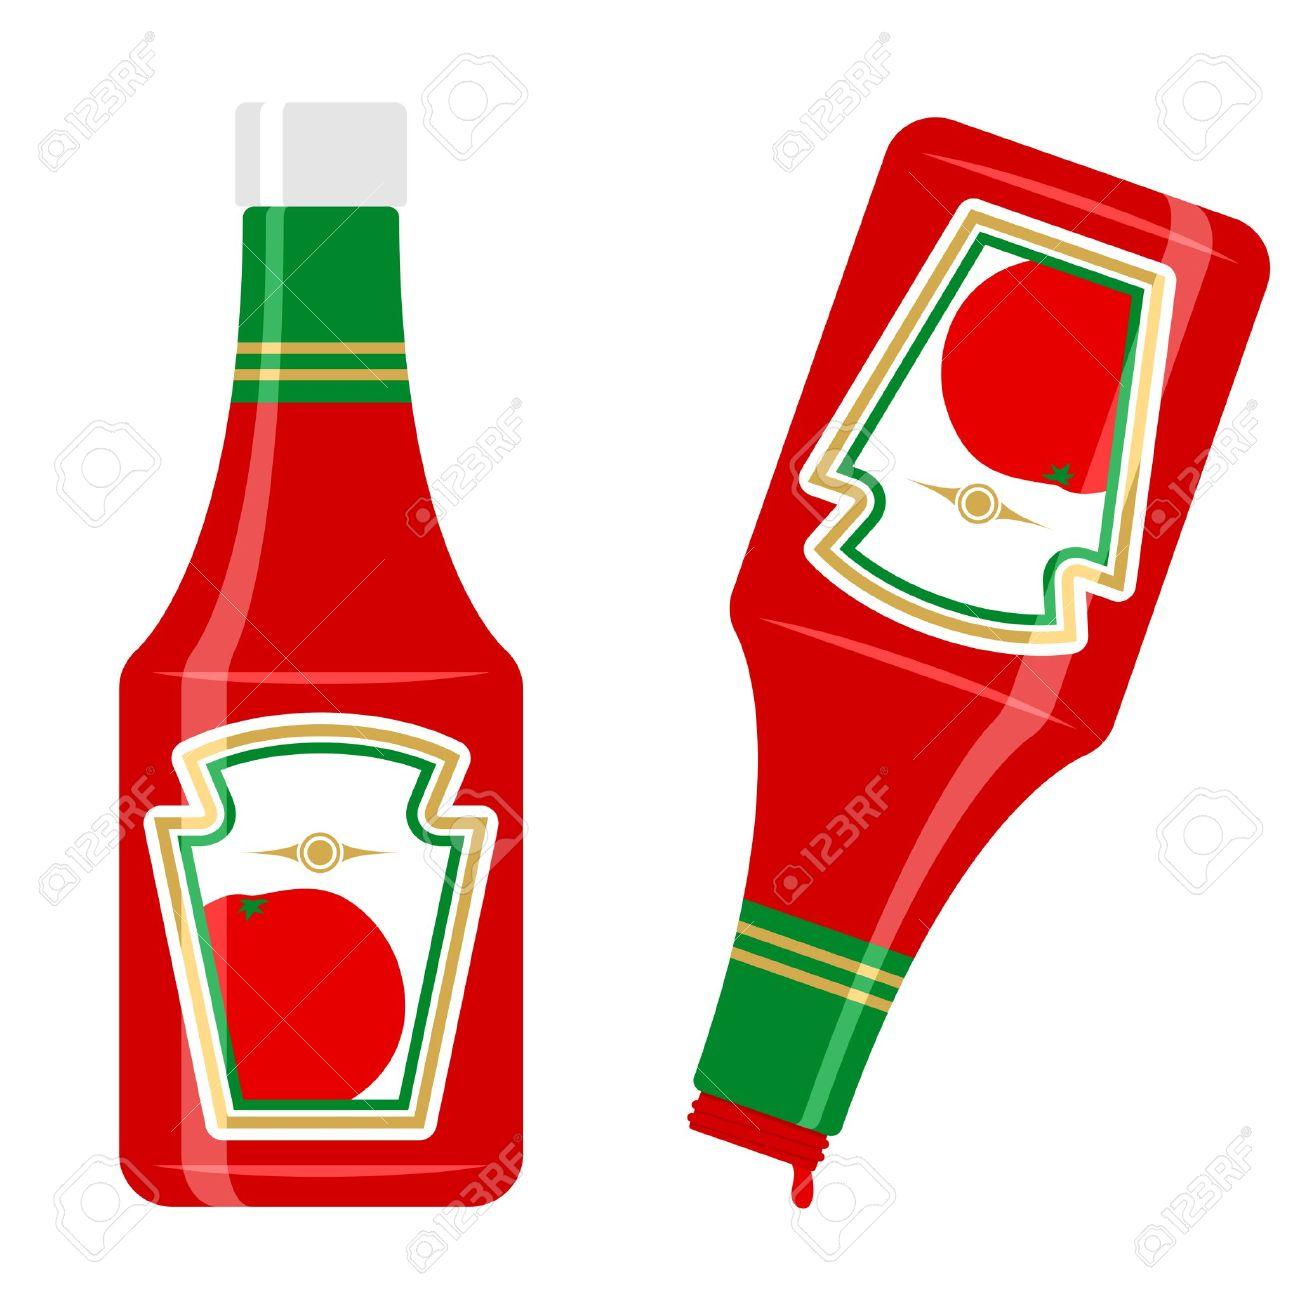 Ketchup bottle Stock Vector - 5187559-Ketchup bottle Stock Vector - 5187559-14